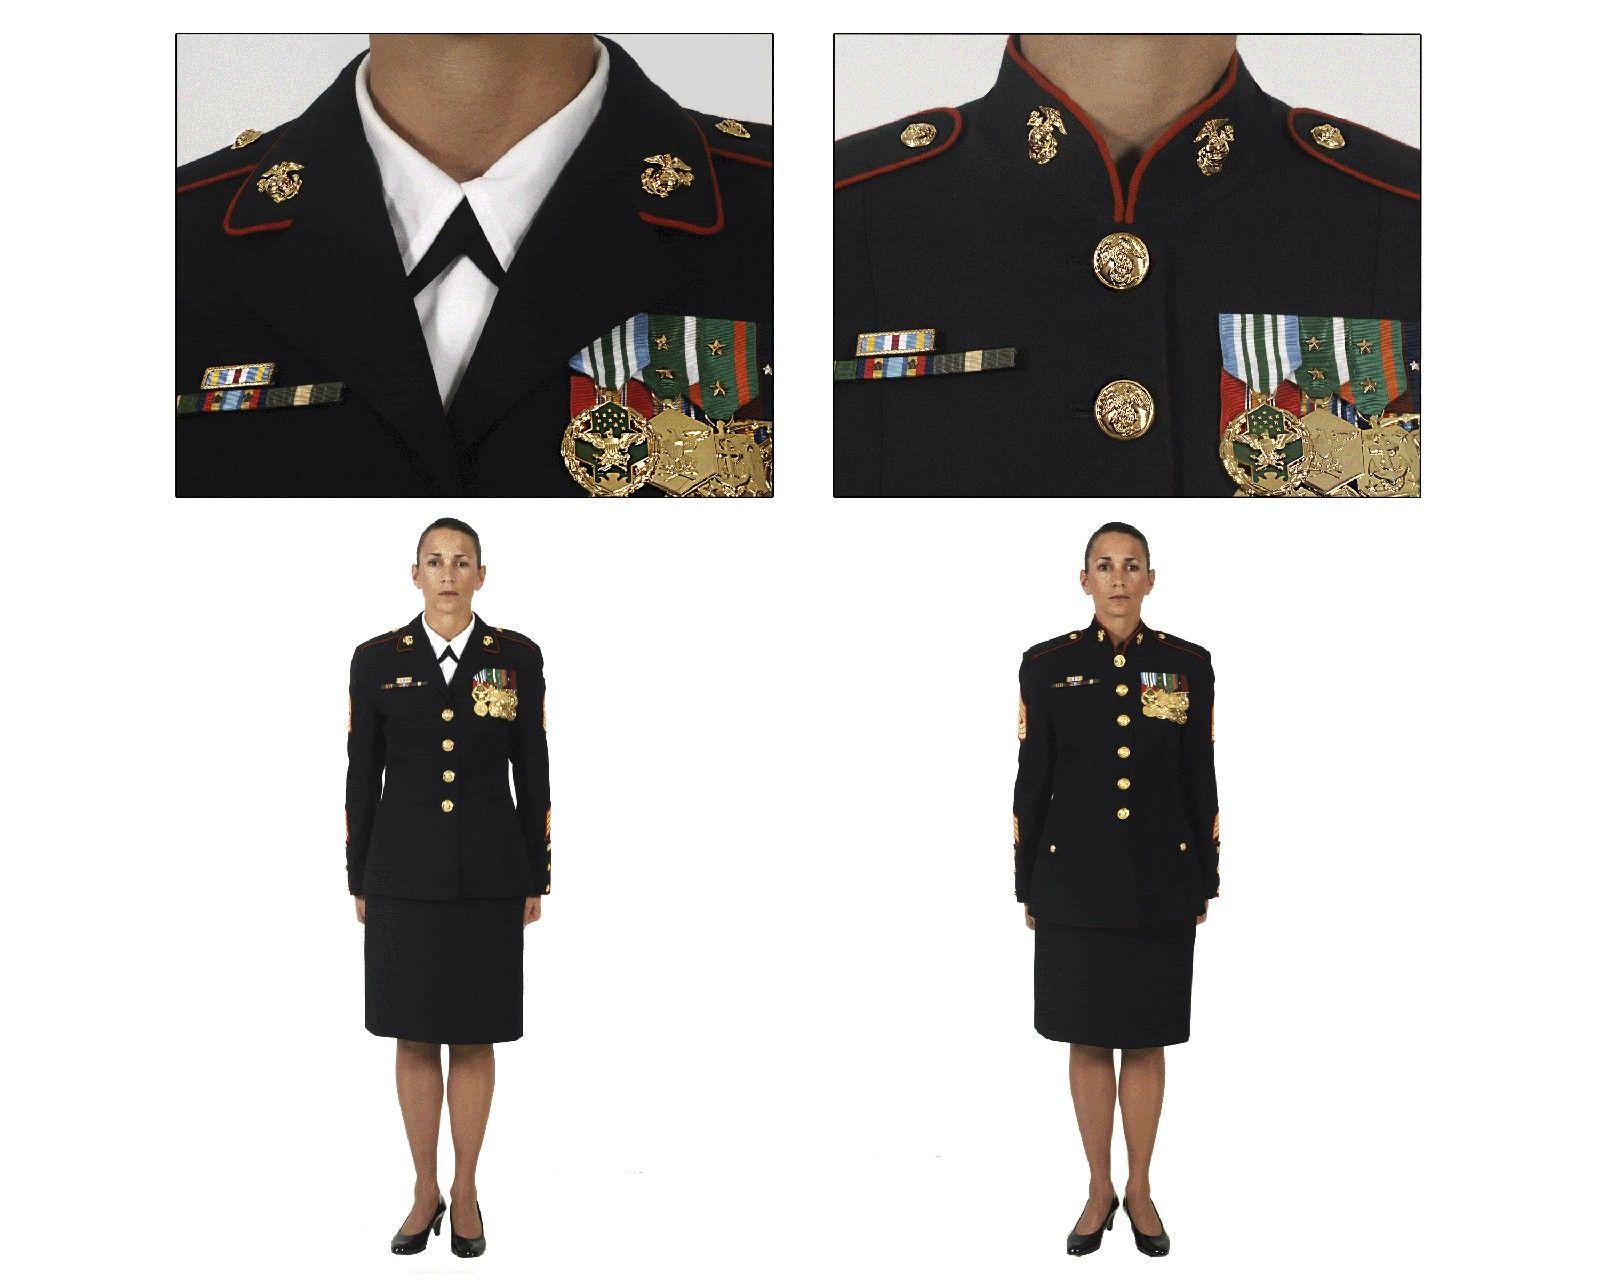 GENUINE U.S MARINE CORPS SERVICE COLLAR DEVICE OFFICER